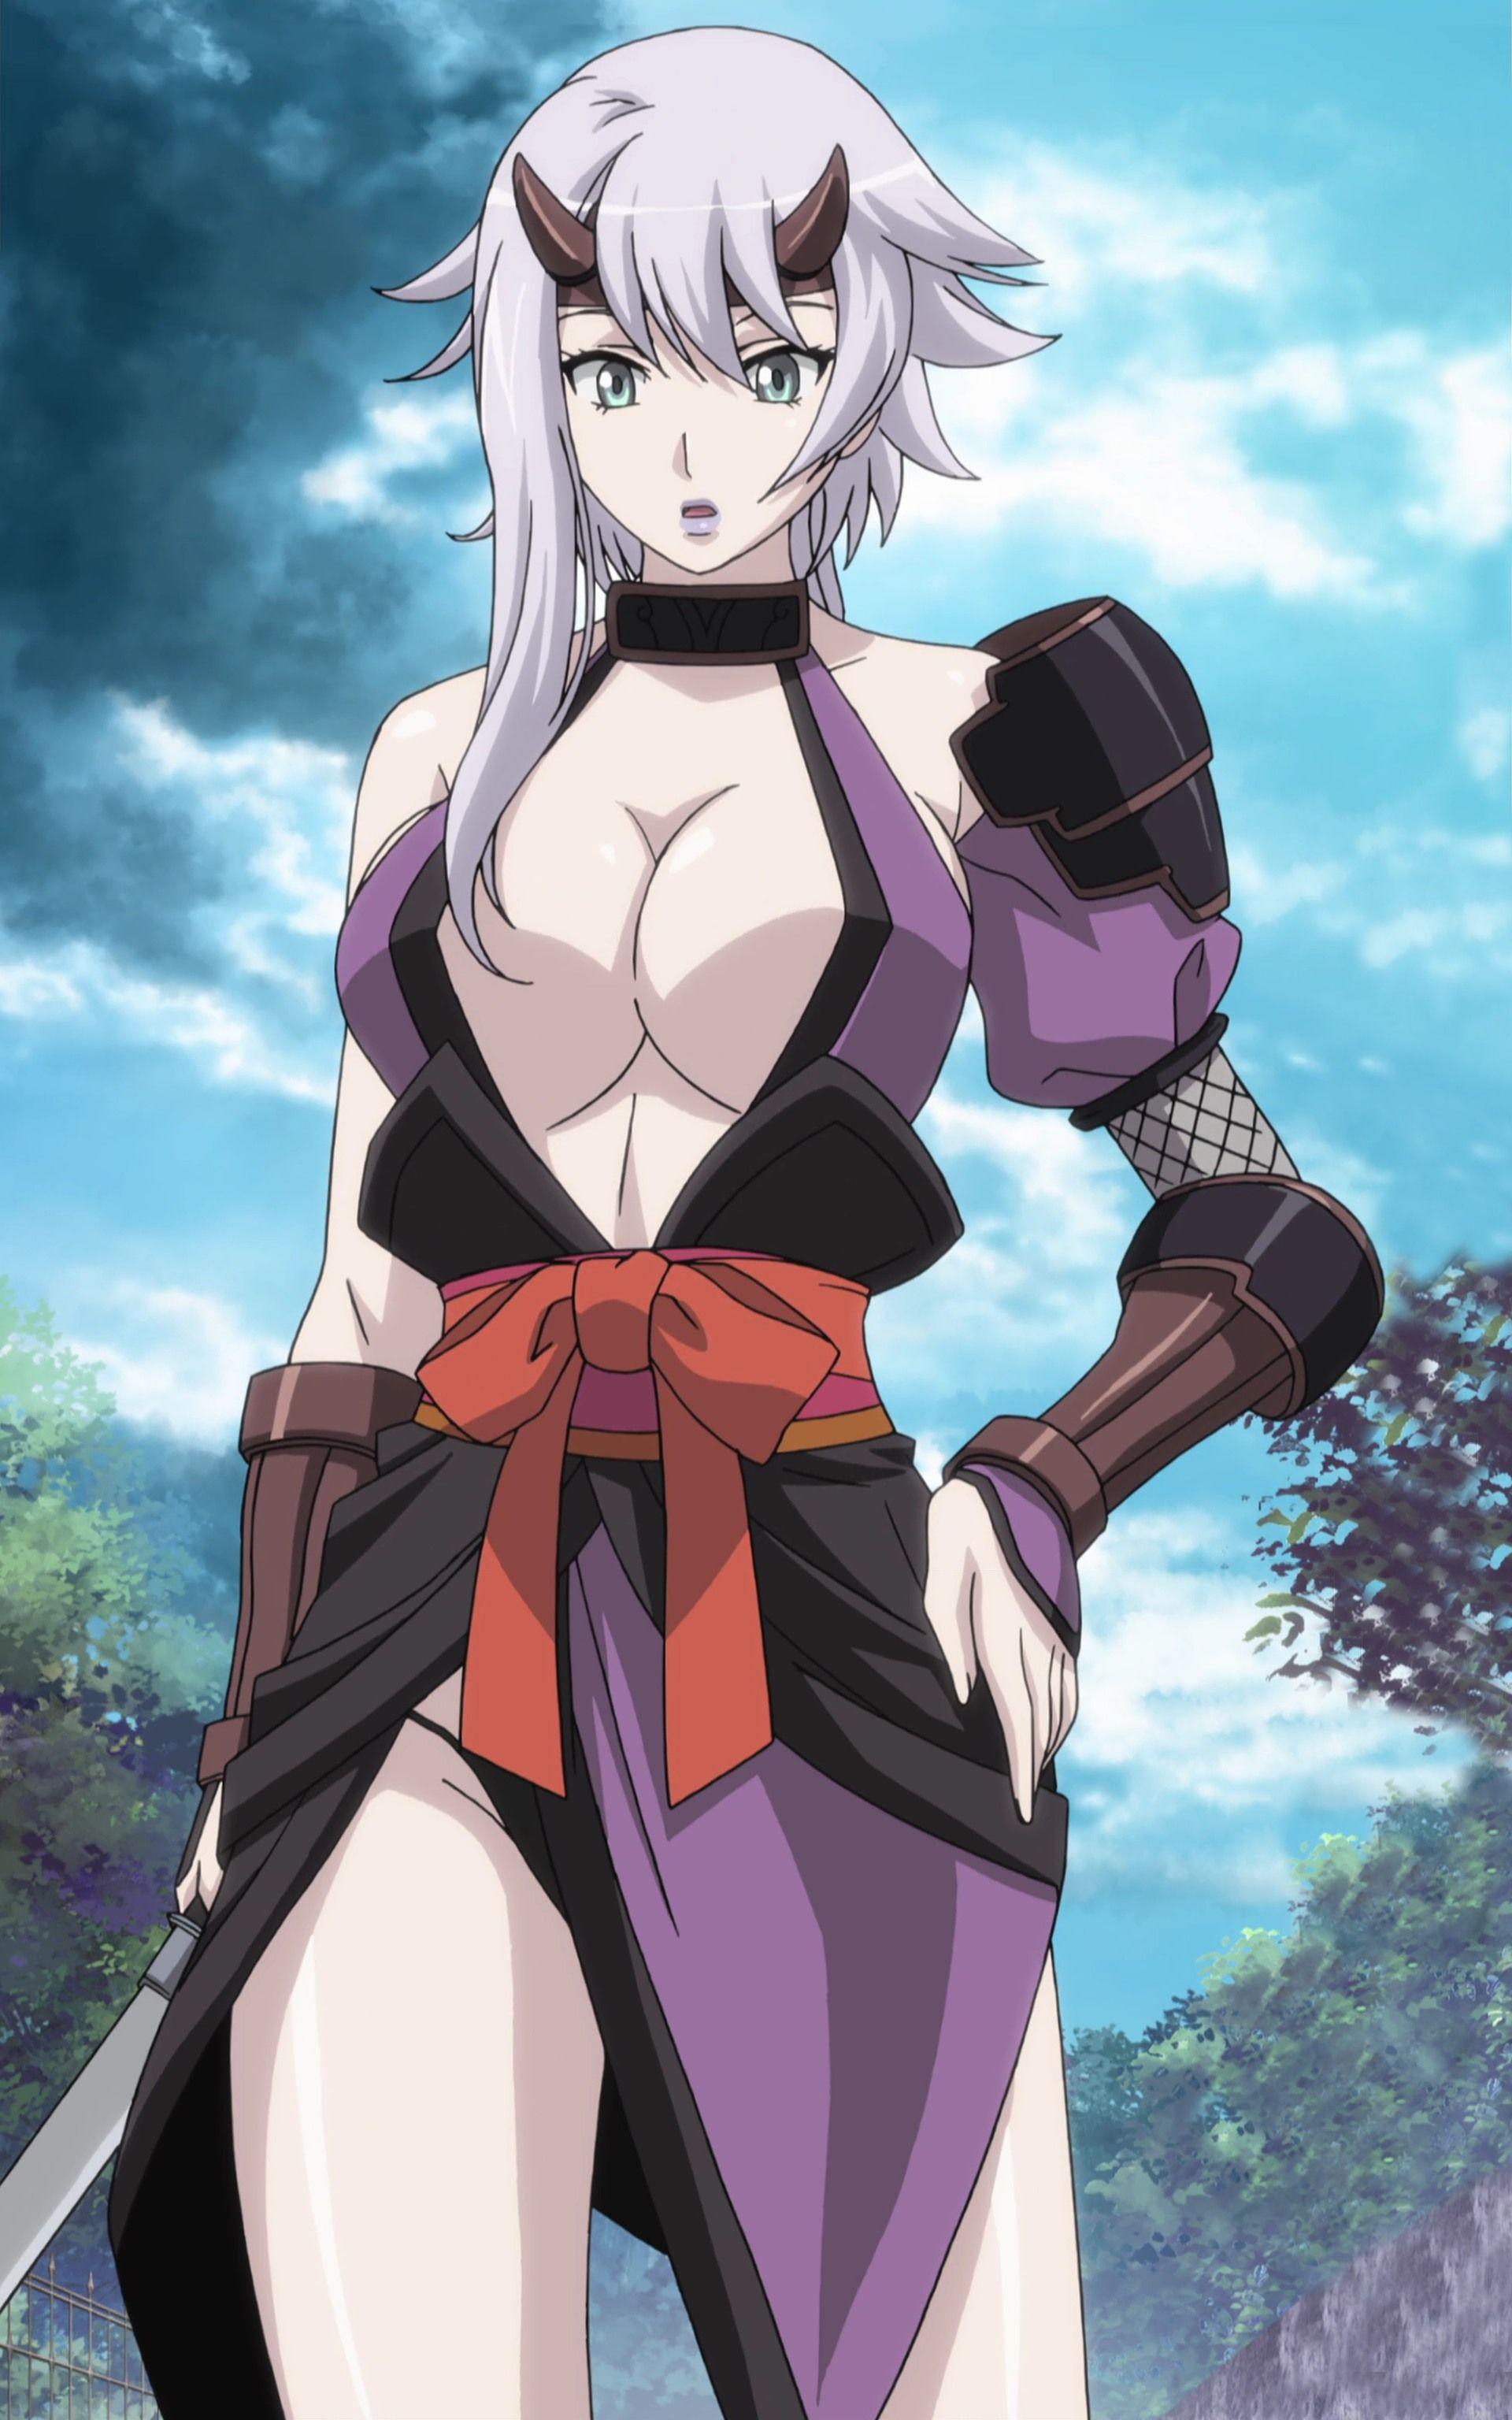 shizuka uncensored hentai 1000+ images about Hentai on Pinterest | Resorts, Why im single and Harems